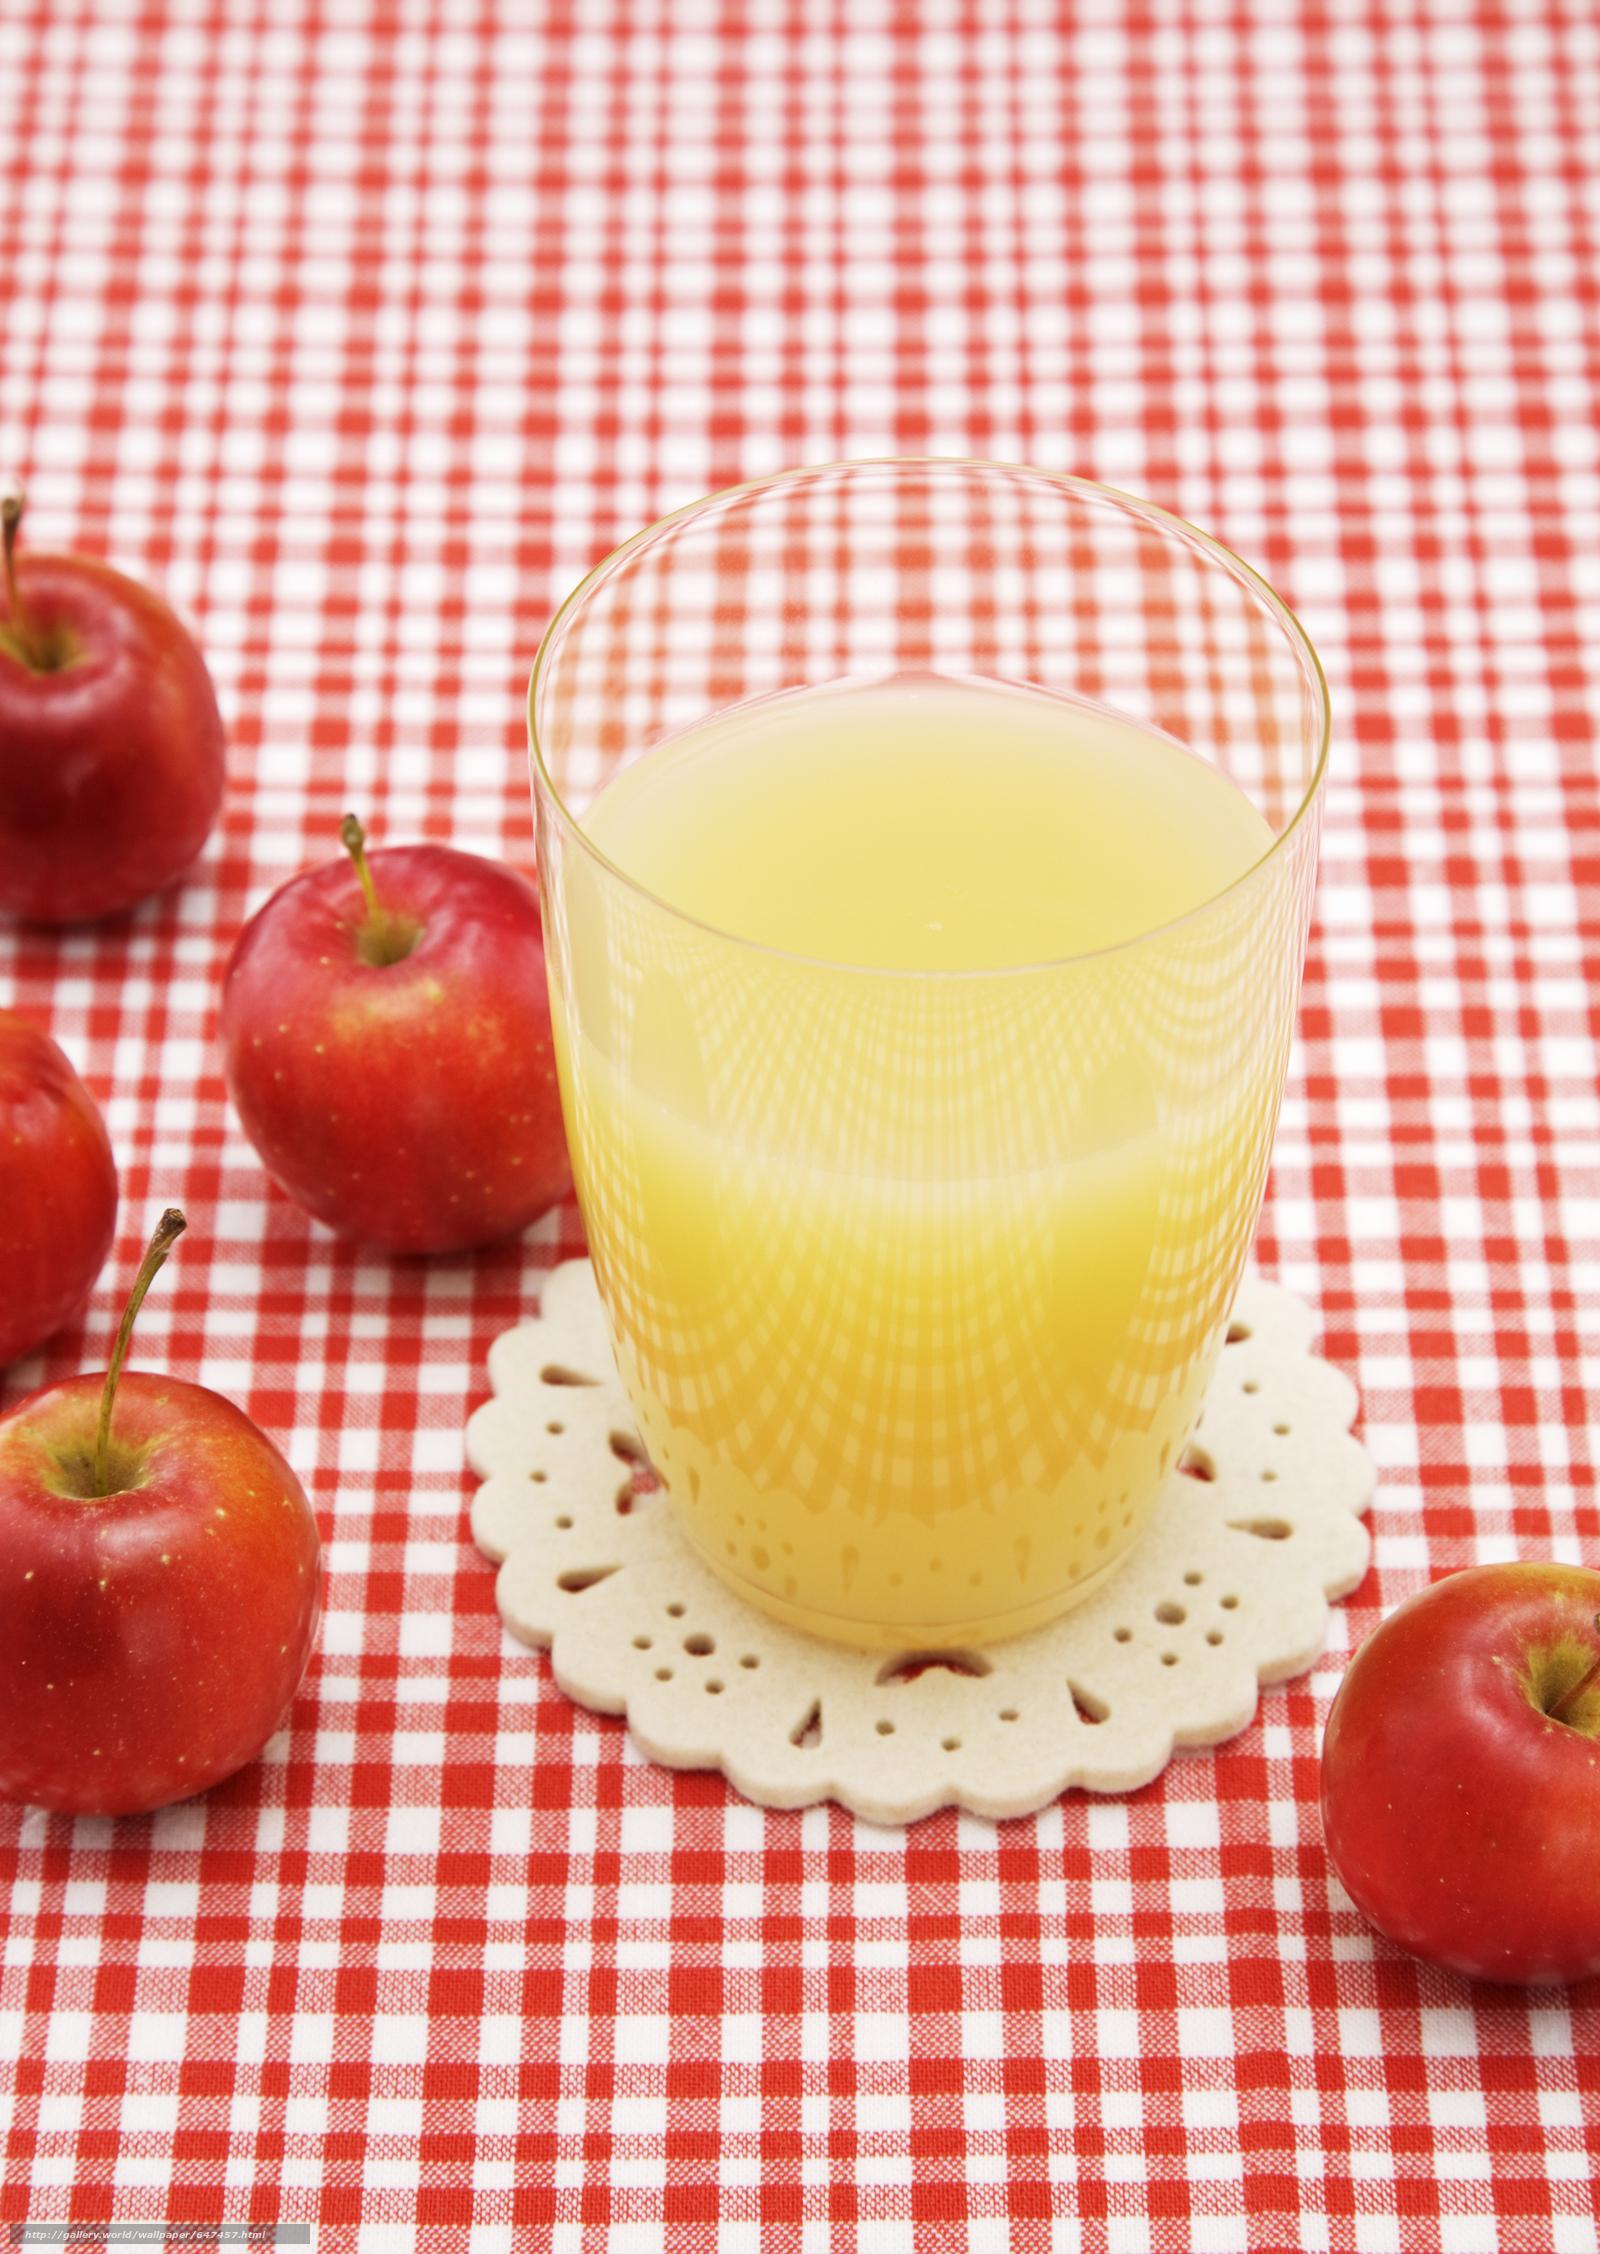 Download wallpaper juice,  fruit,  apple,  apples free desktop wallpaper in the resolution 2094x2950 — picture №647457